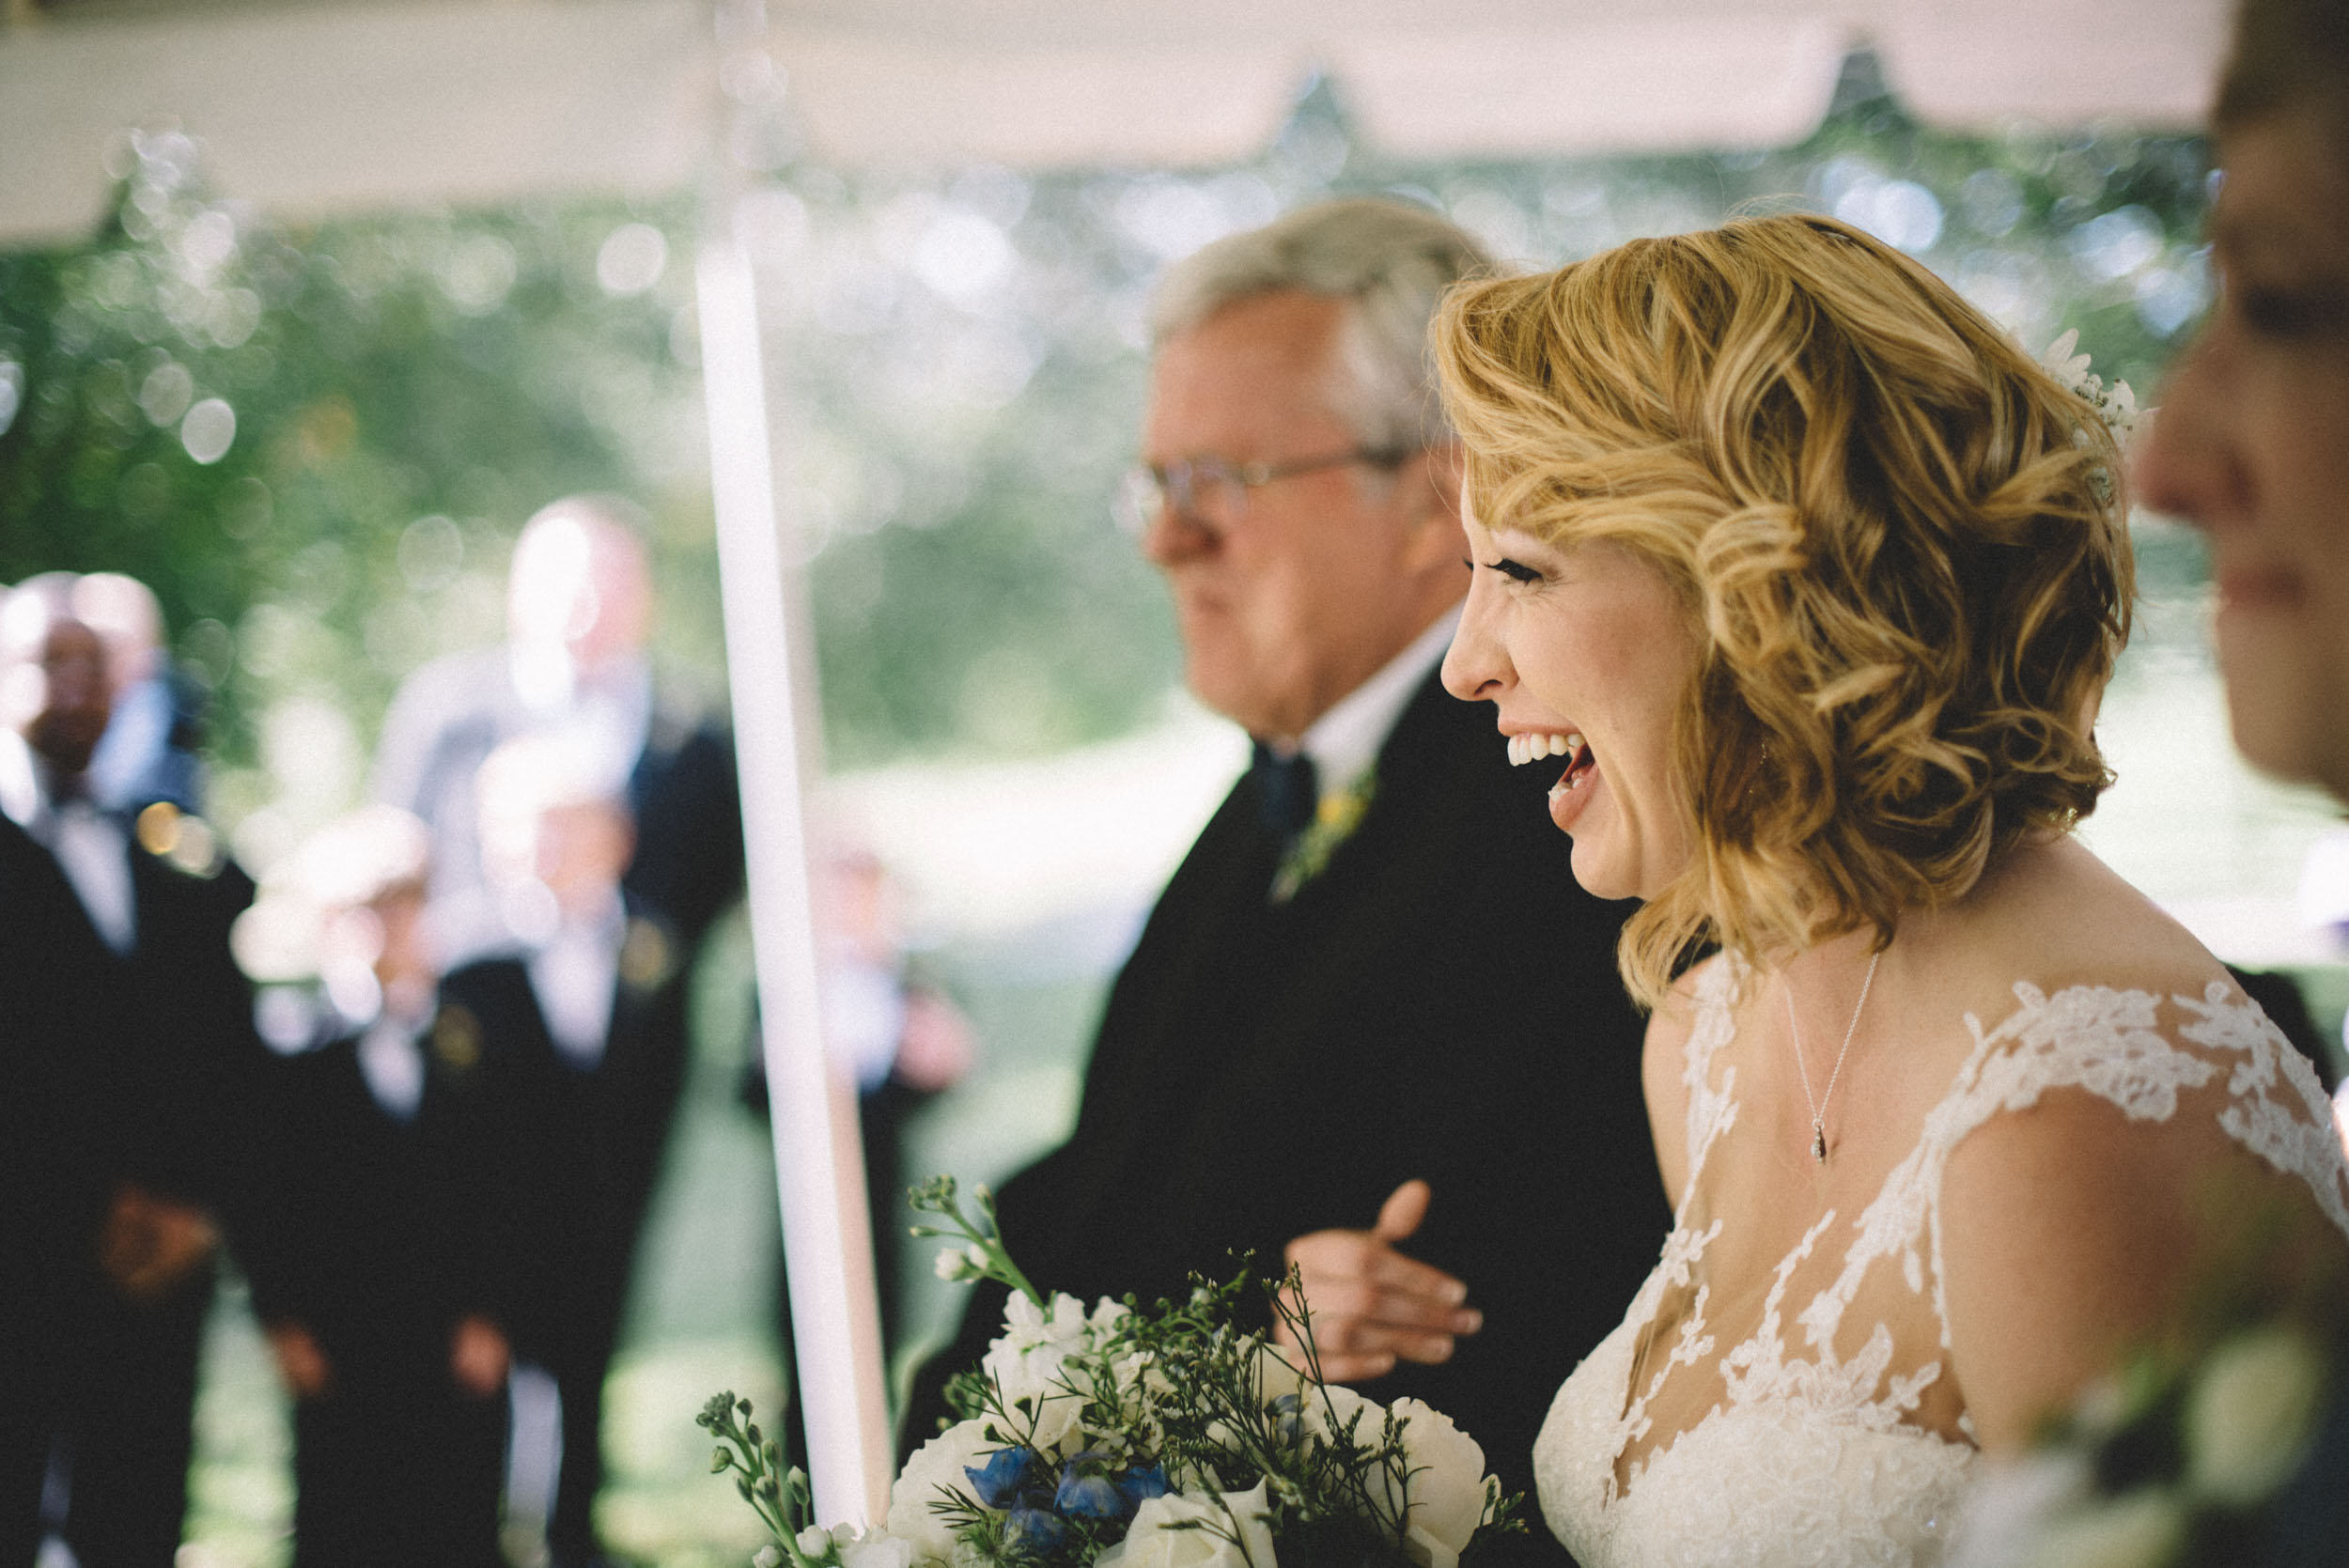 Gaie-Lea-Staunton-weddding-photographer-49.jpg